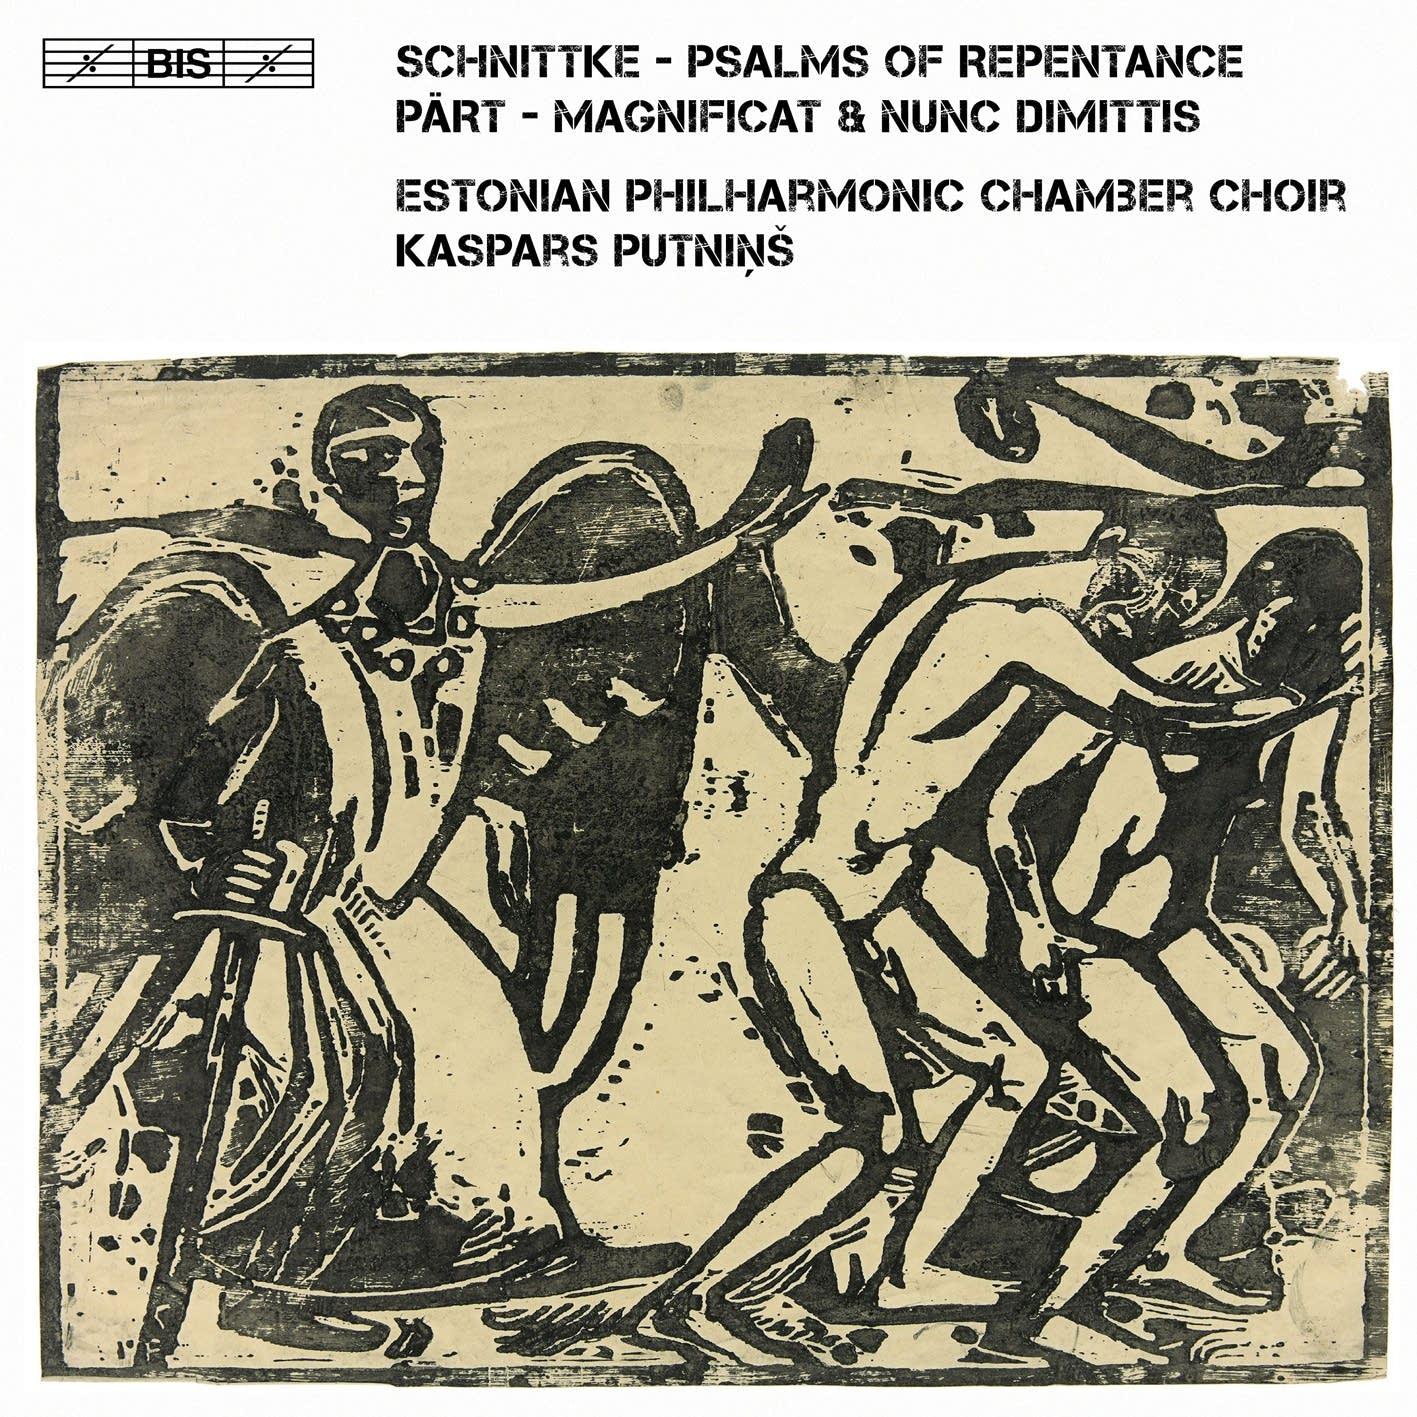 'Schnittke & Part - Choral Works'